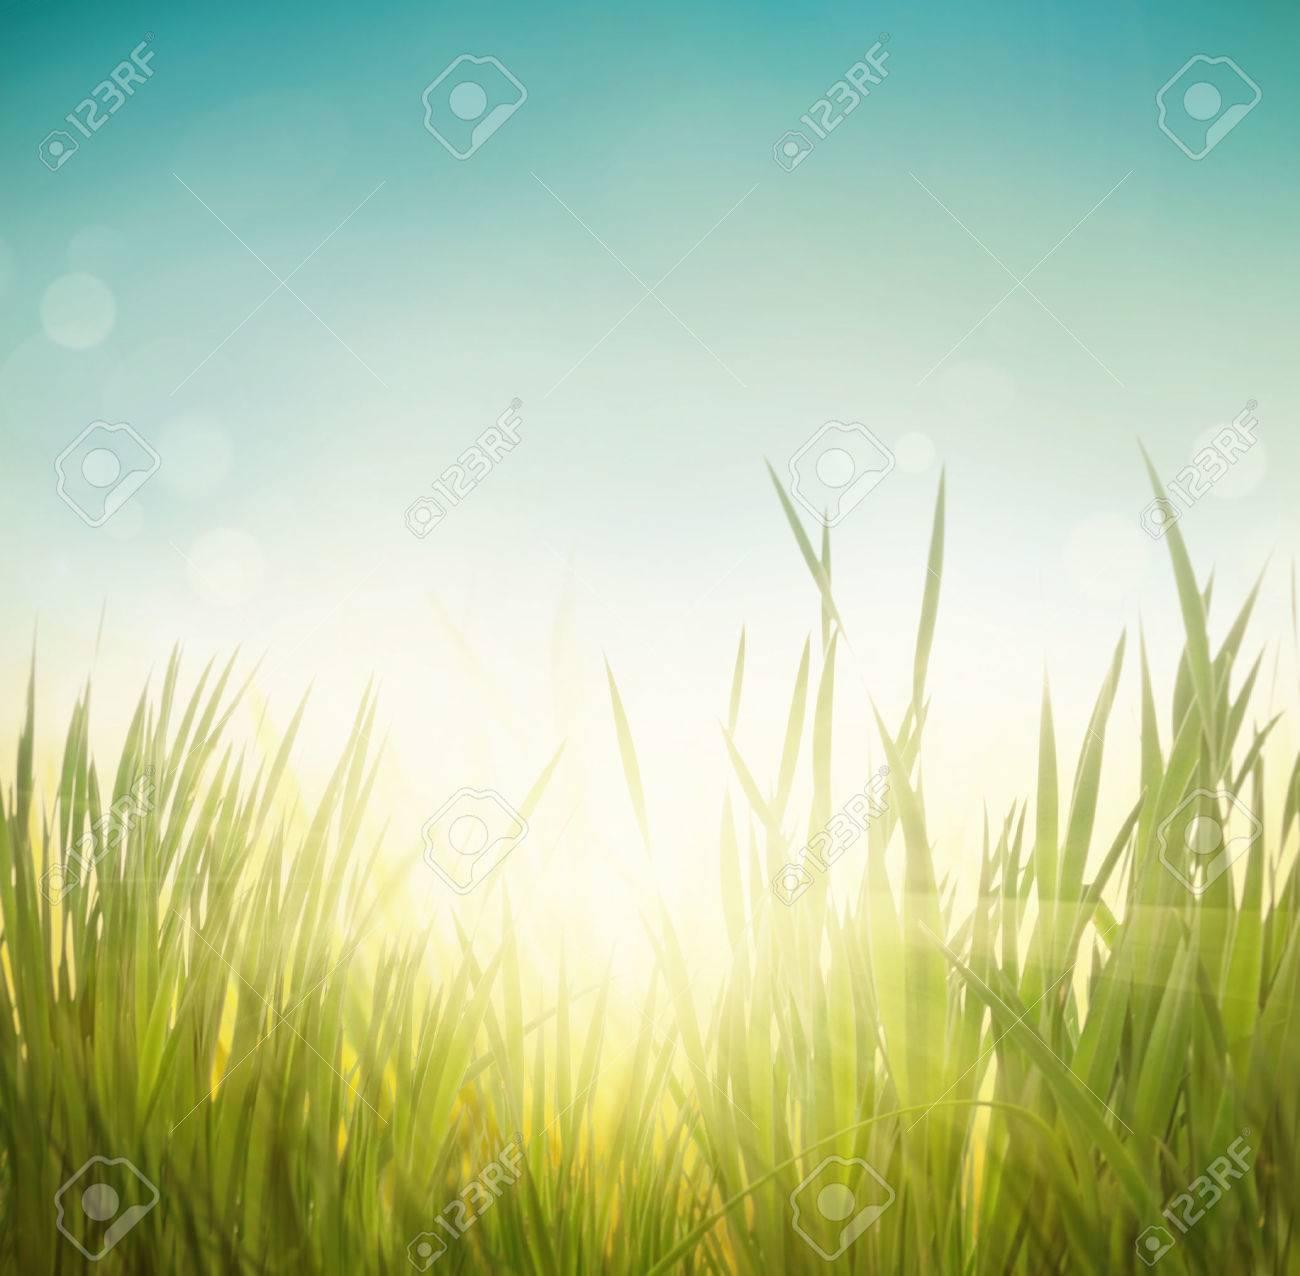 Spring grass. Blur background. Summer nature. Bokeh blurred background. - 42140250